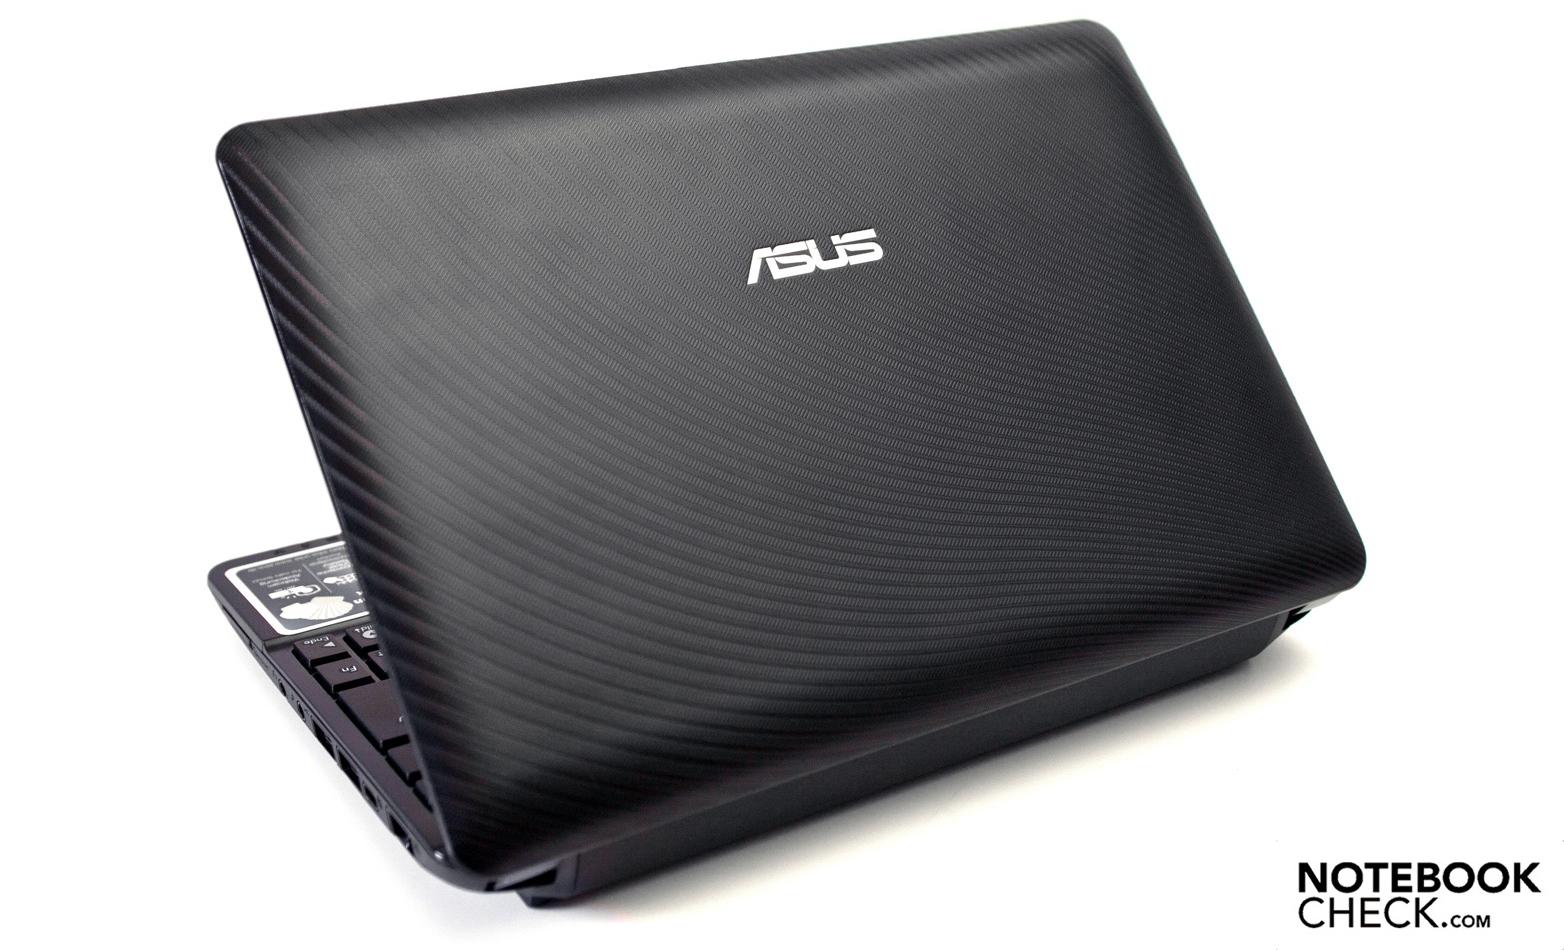 Asus Eee PC 1015P Fingerprint Driver UPDATE